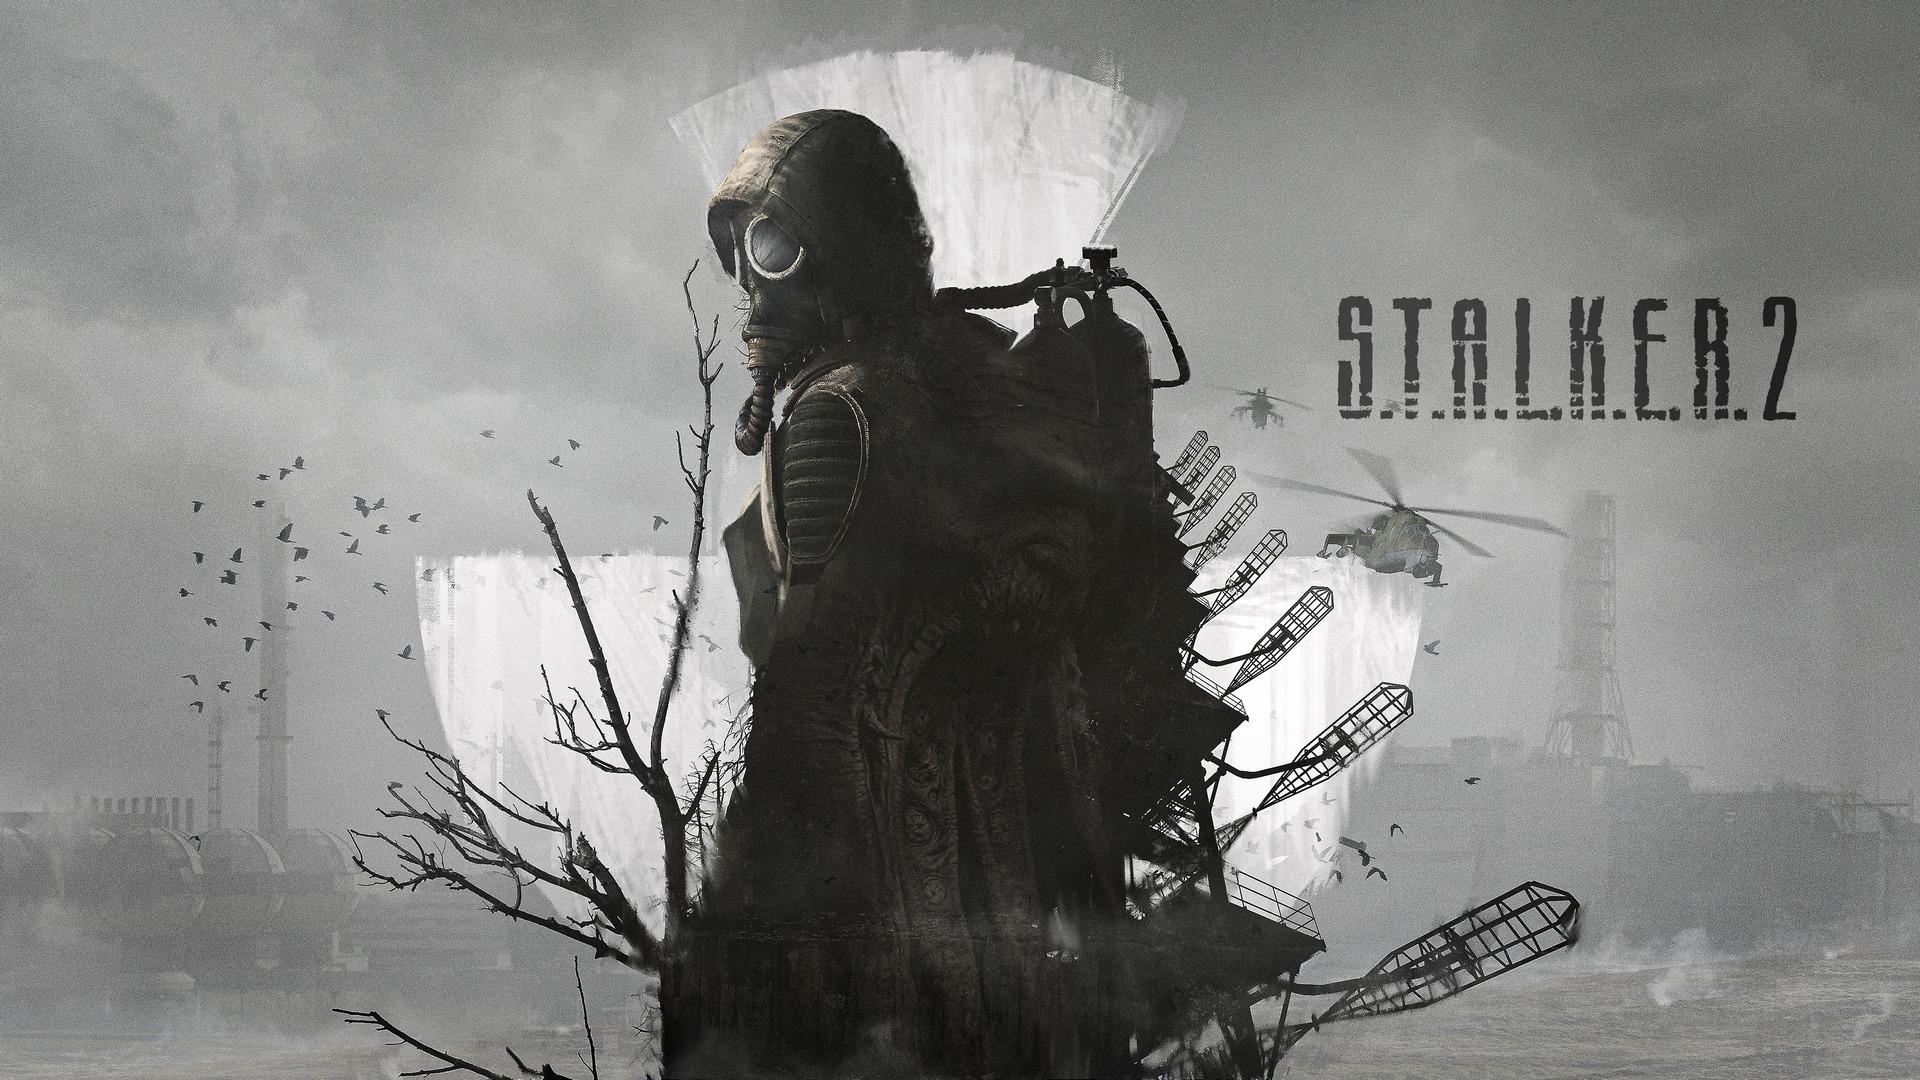 """S.T.A.L.K.E.R 2"" a enfin une date de sortie et un nouveau titre ! (E3 2021)"